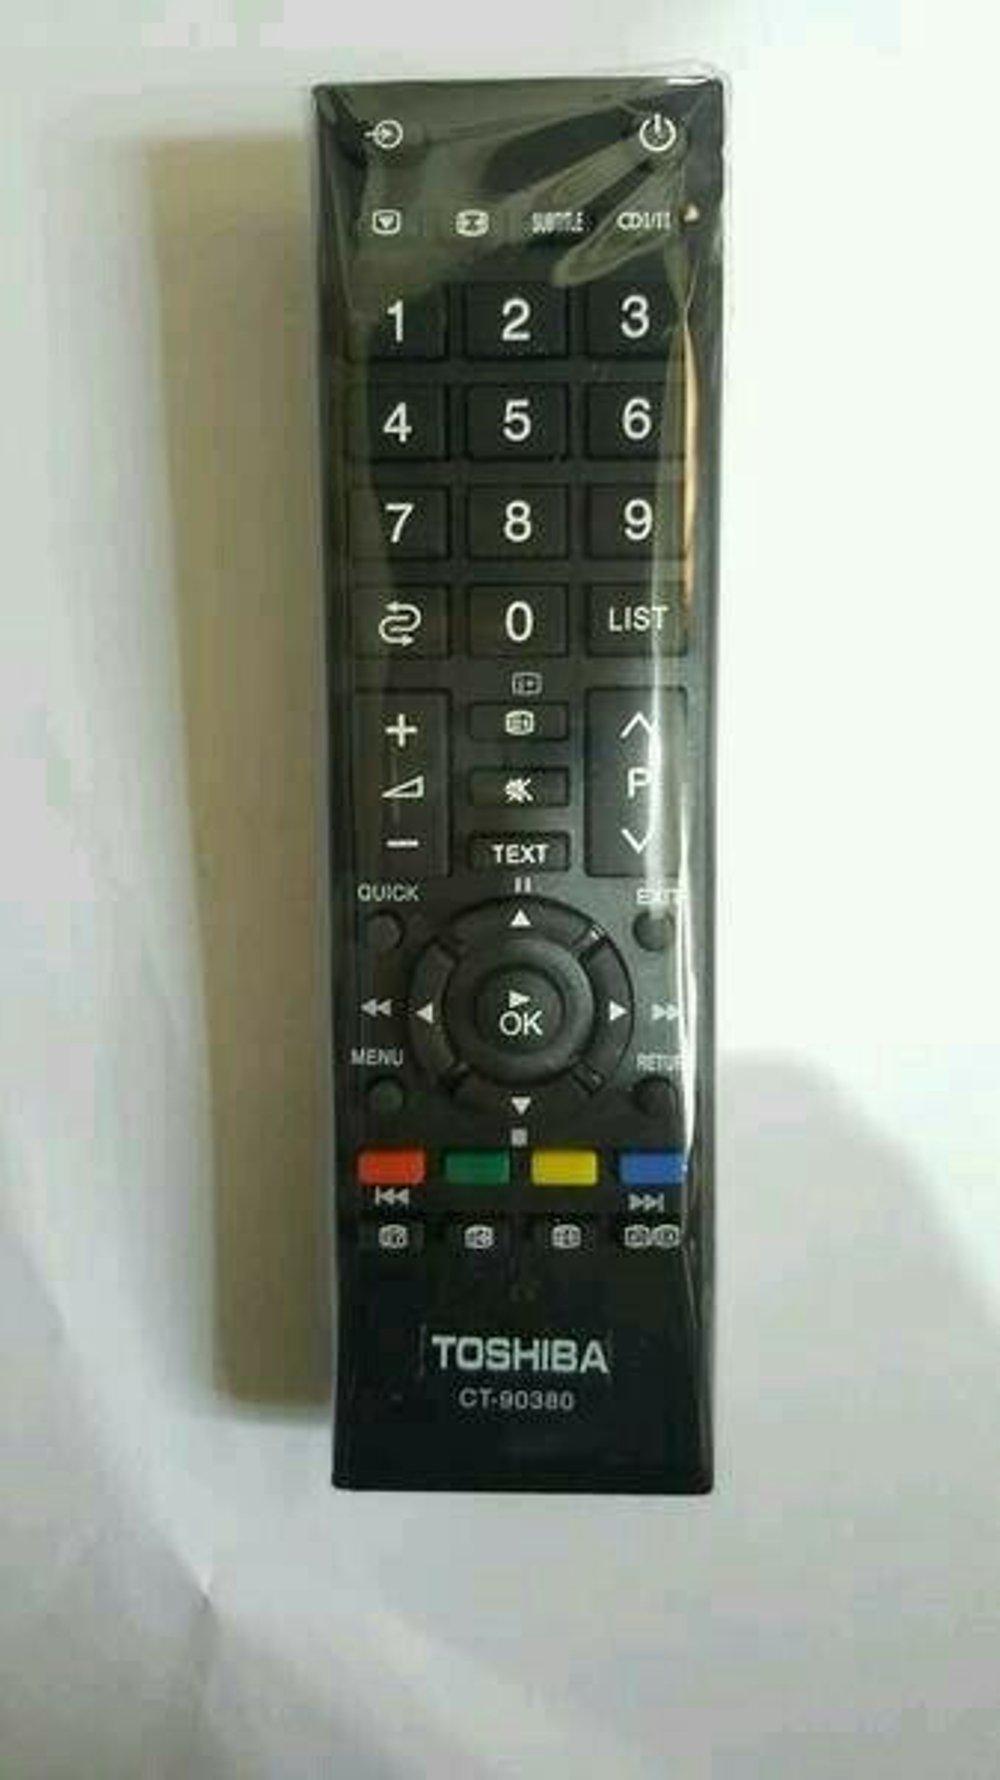 REMOTE CONTROL Remote TV TIVI Toshiba Tosiba Original Asli tabung Lcd Led_SalmanCell